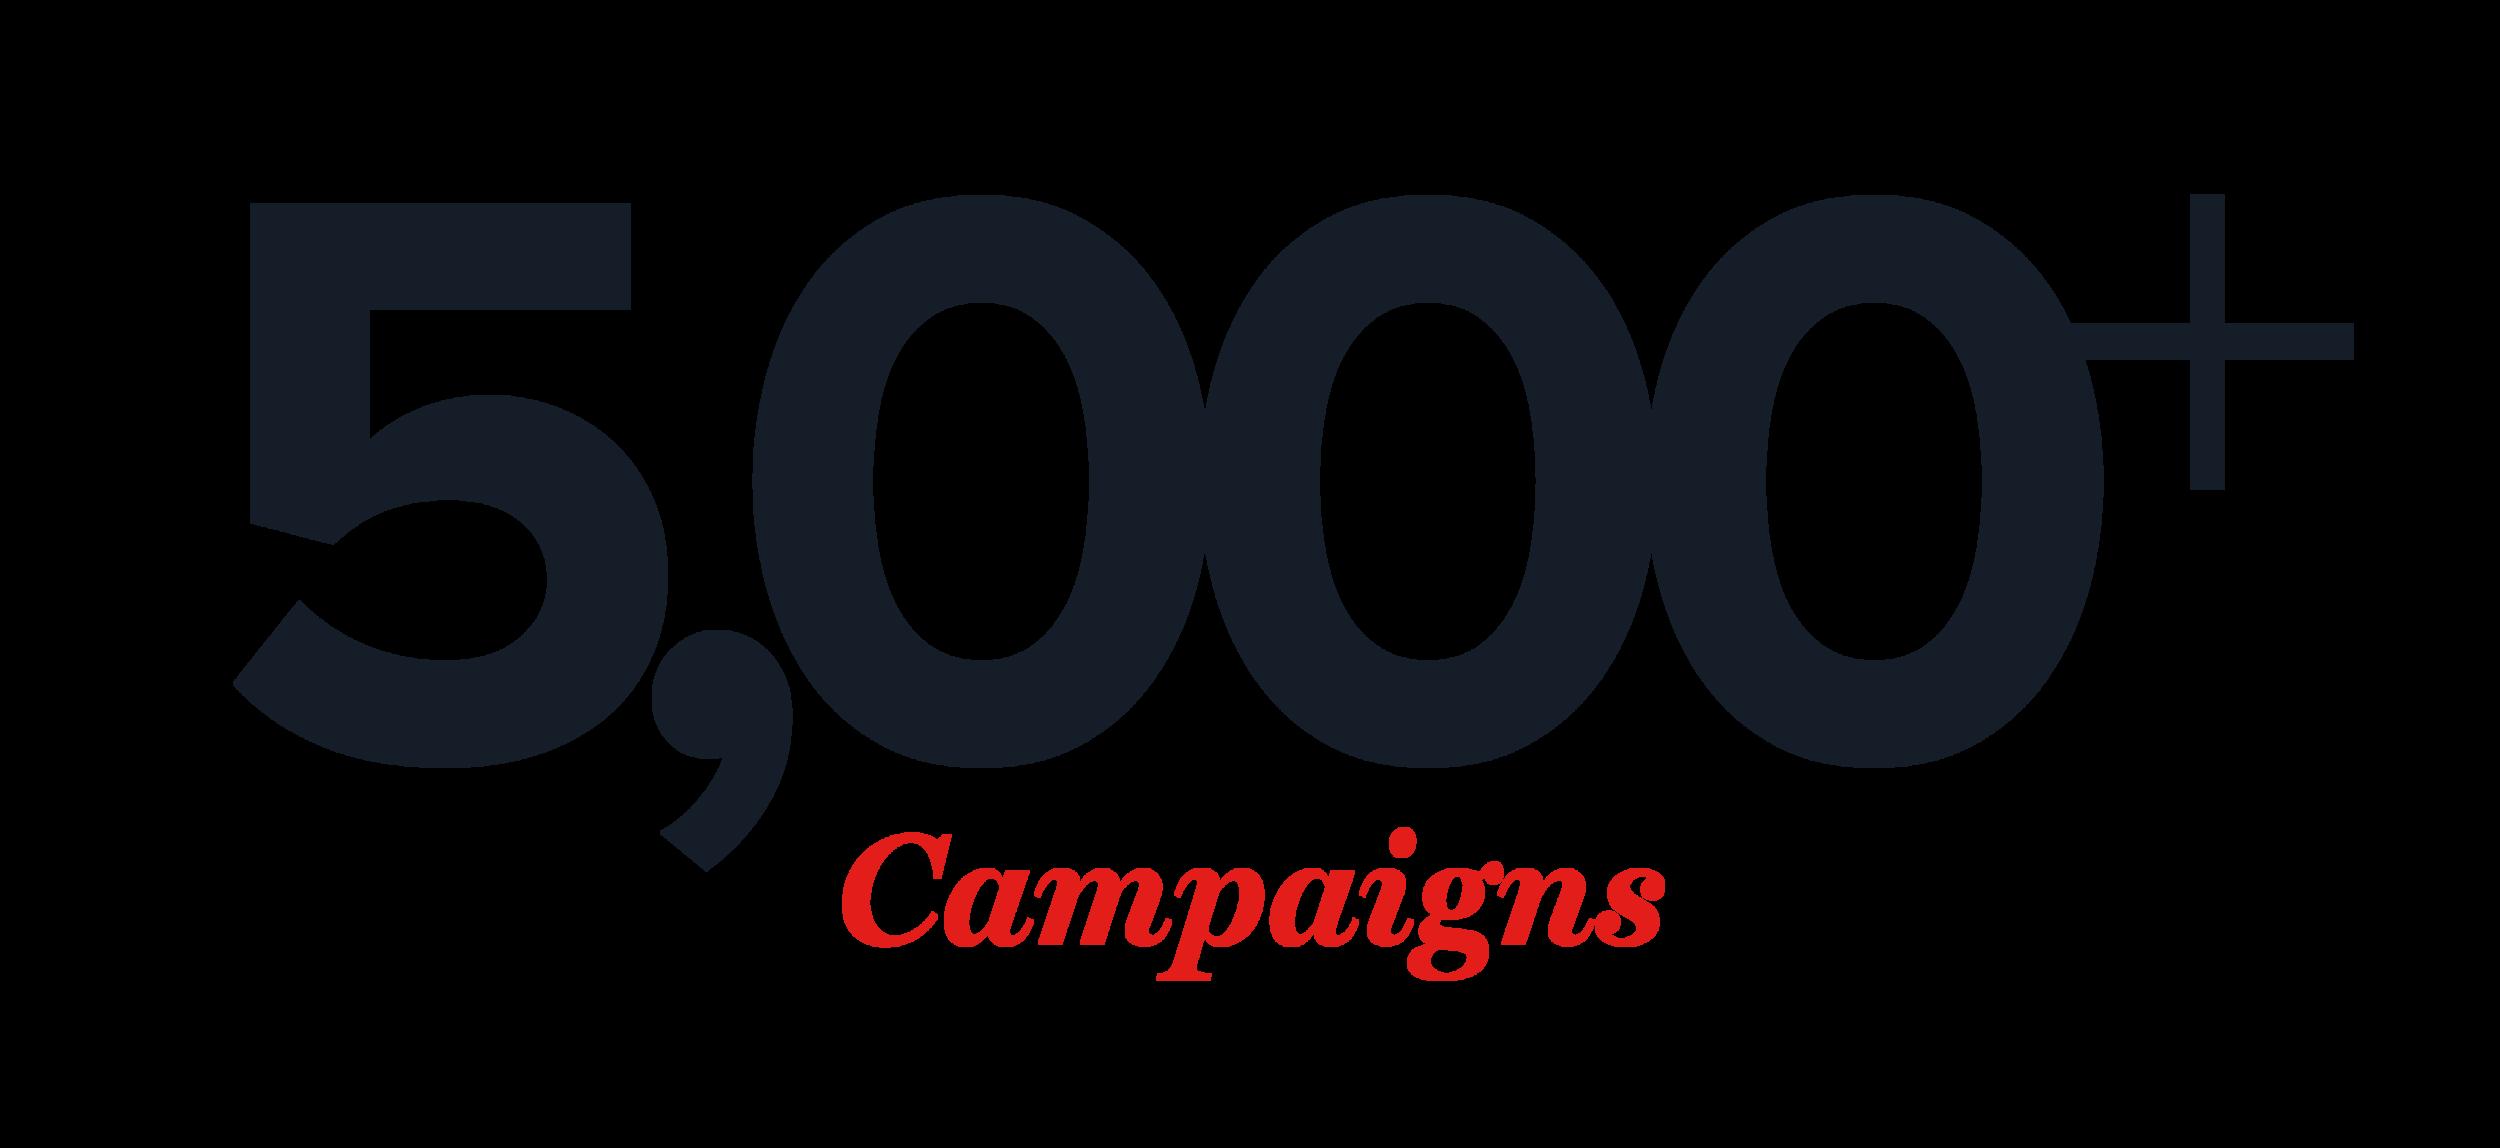 matter_more_media_campaigns.jpg